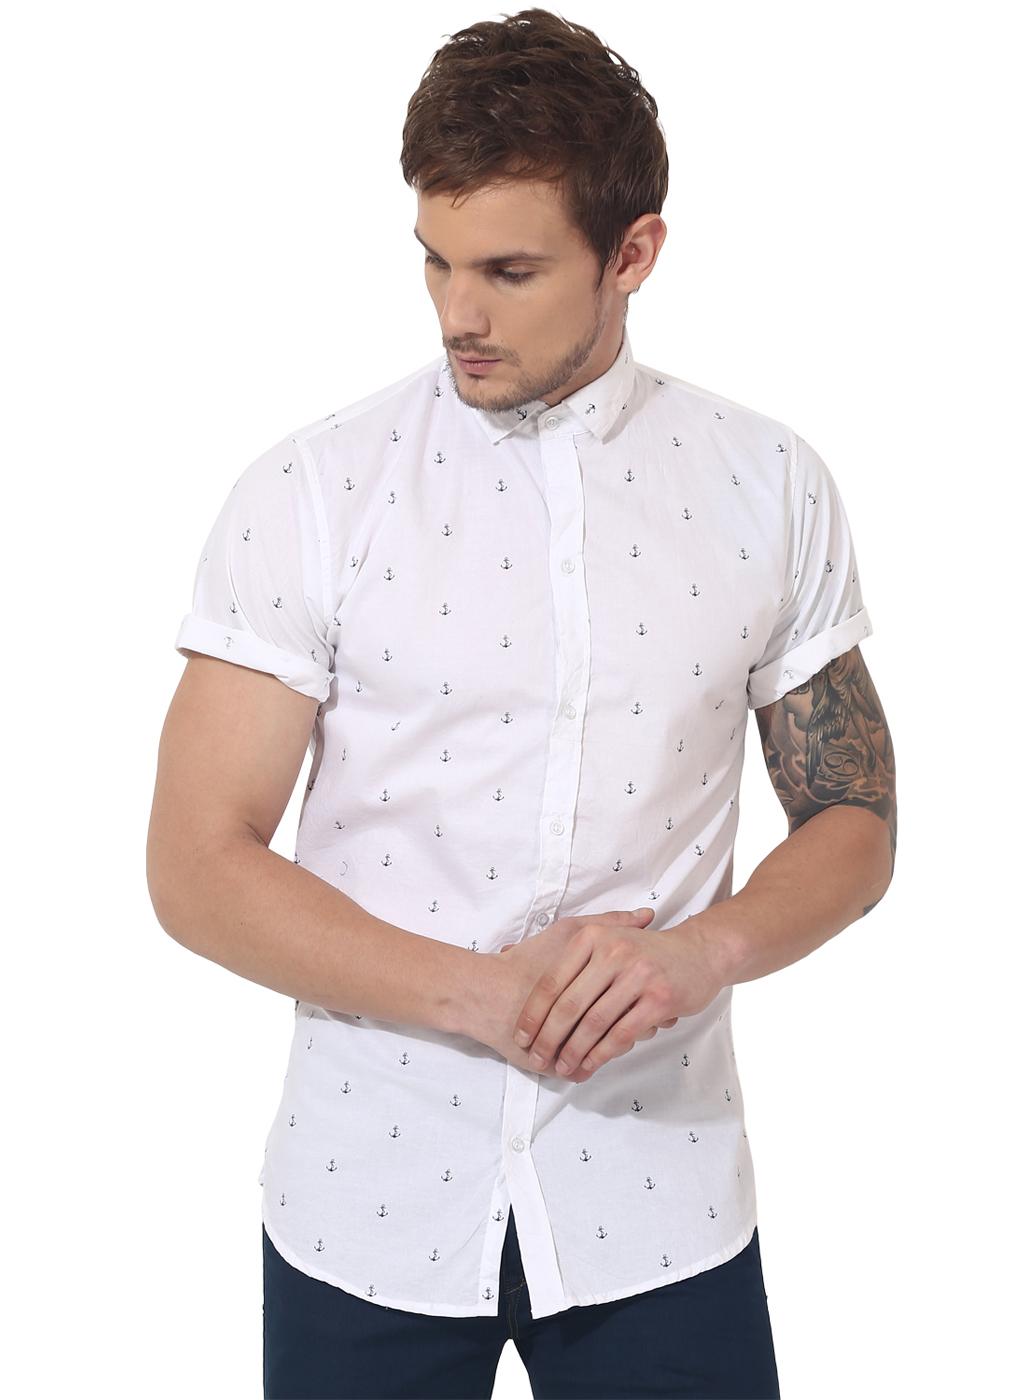 White anchor printed casual shirt